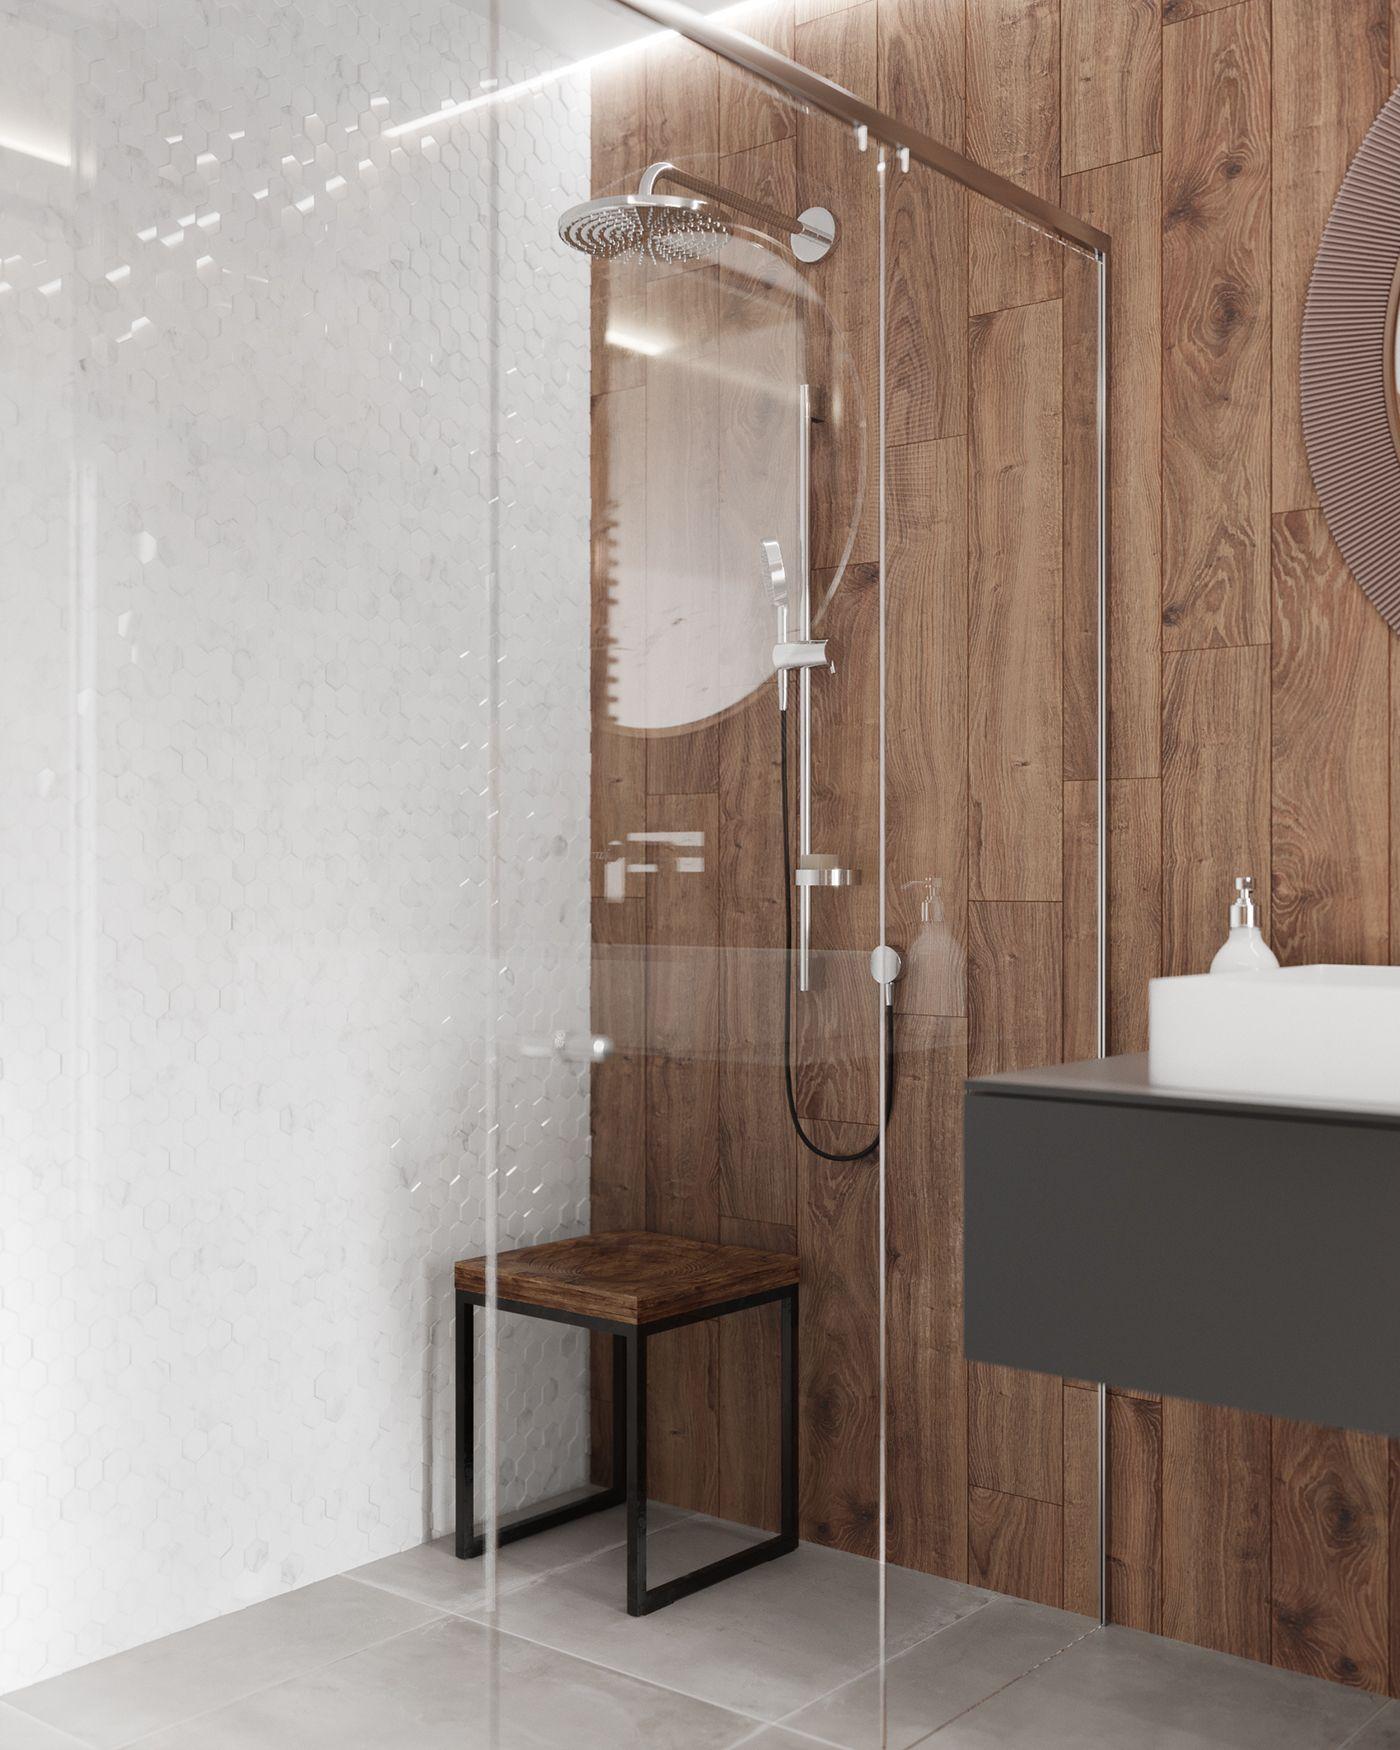 Apartment In Minimalist StyleVisualization: VizLine Studio